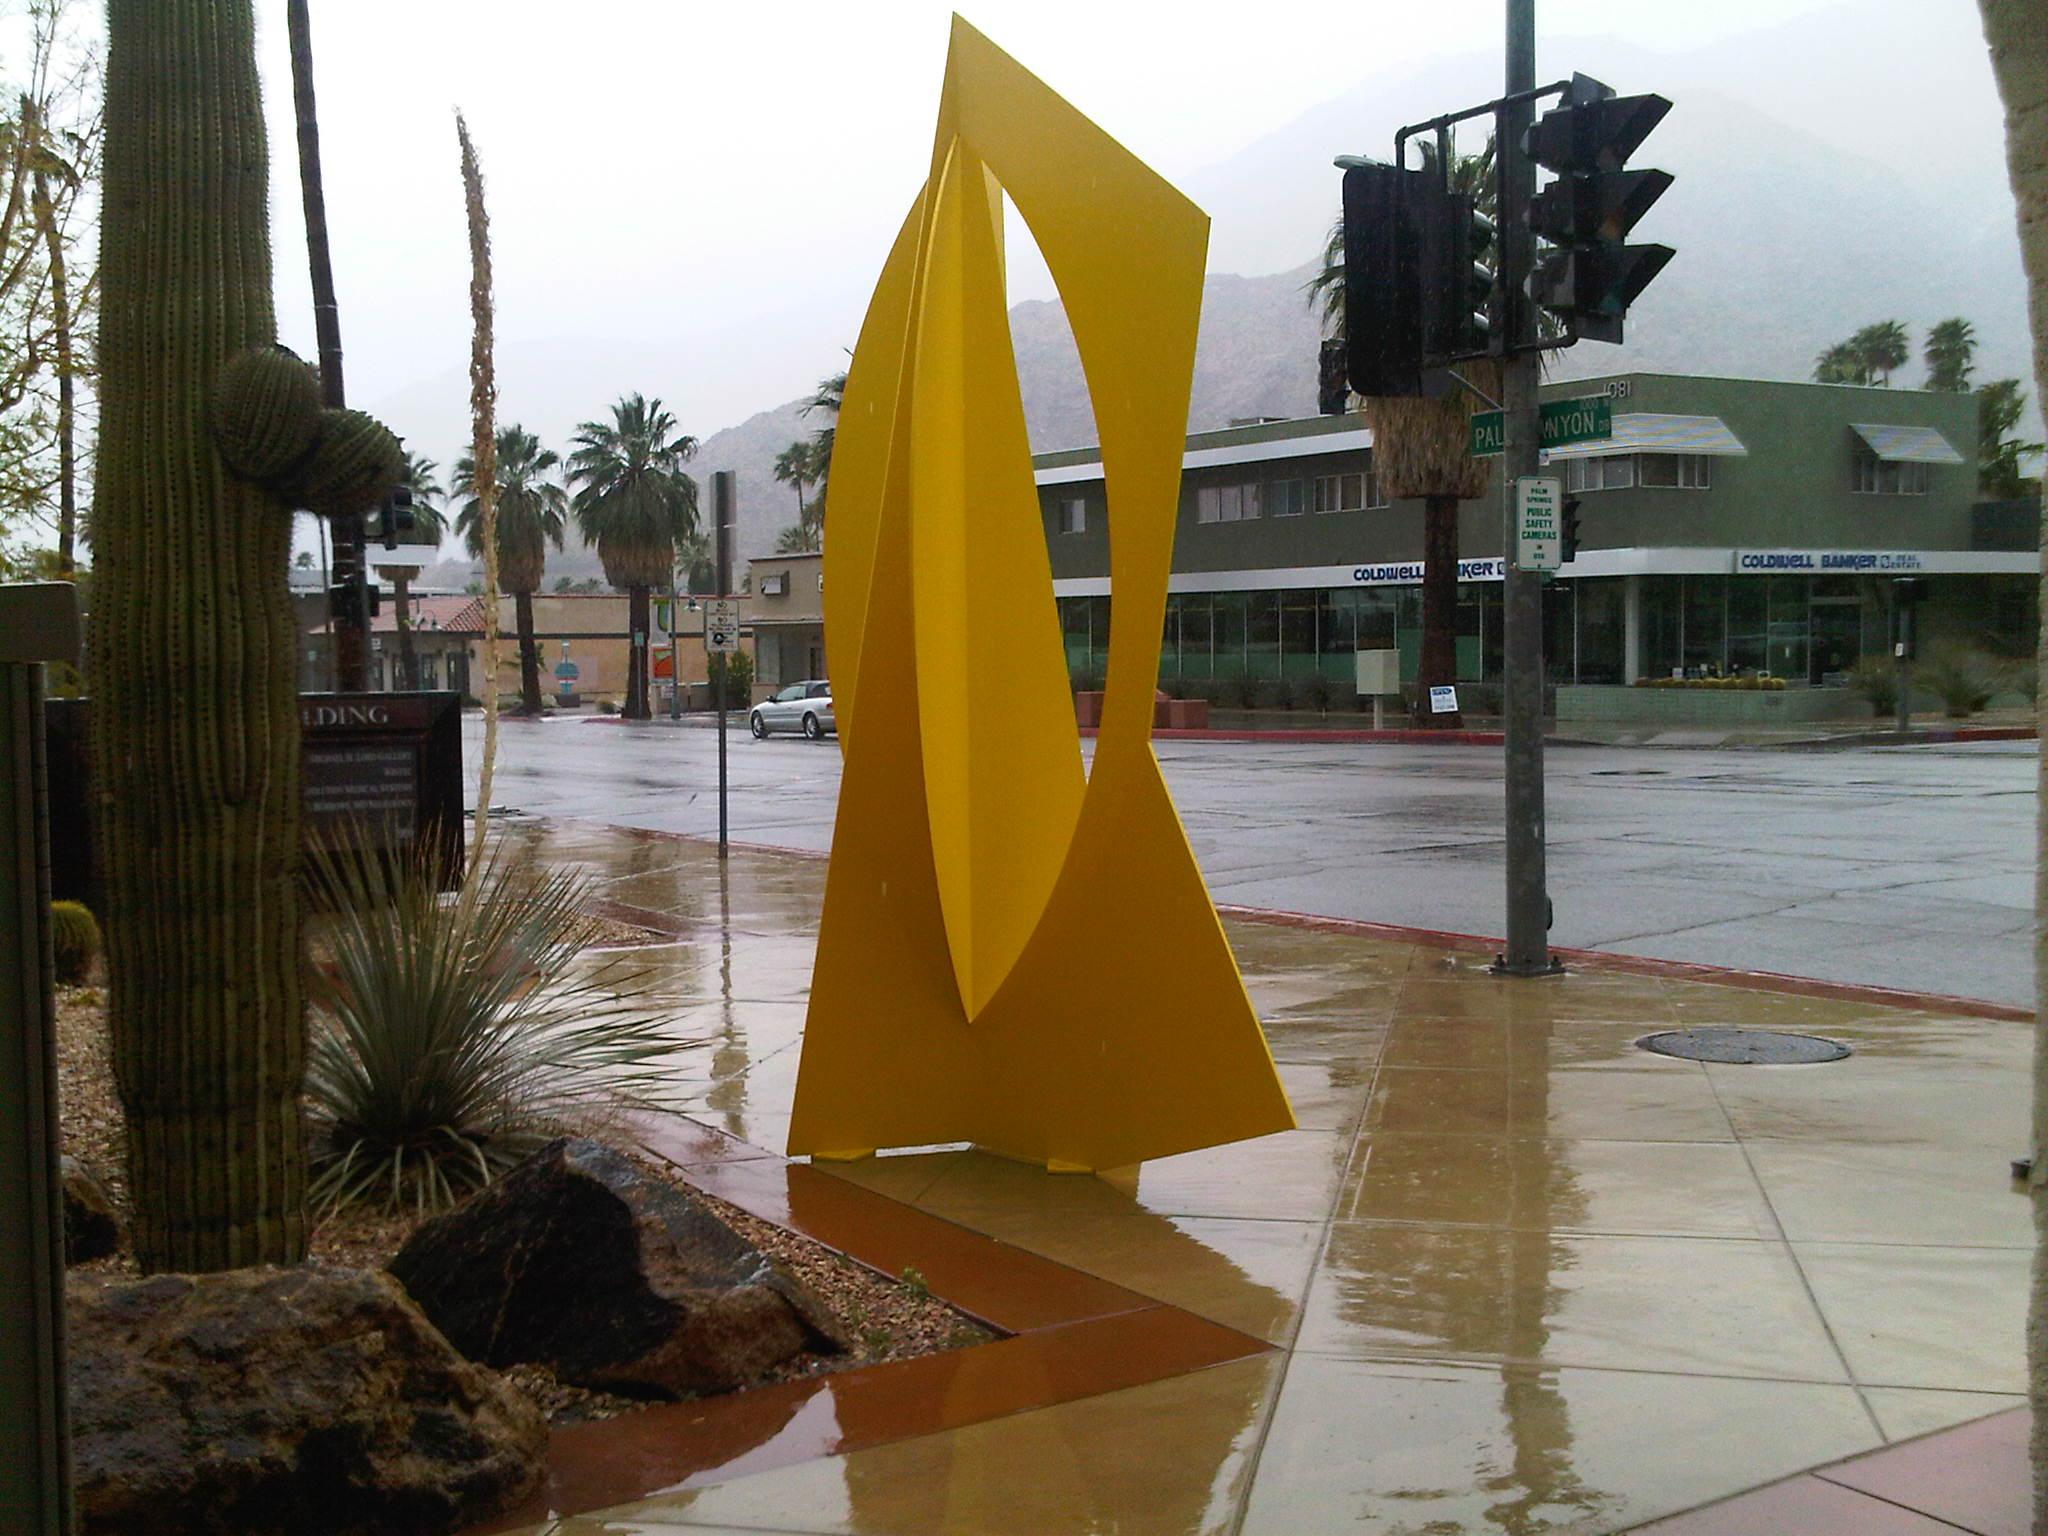 in Palm Springs, CA